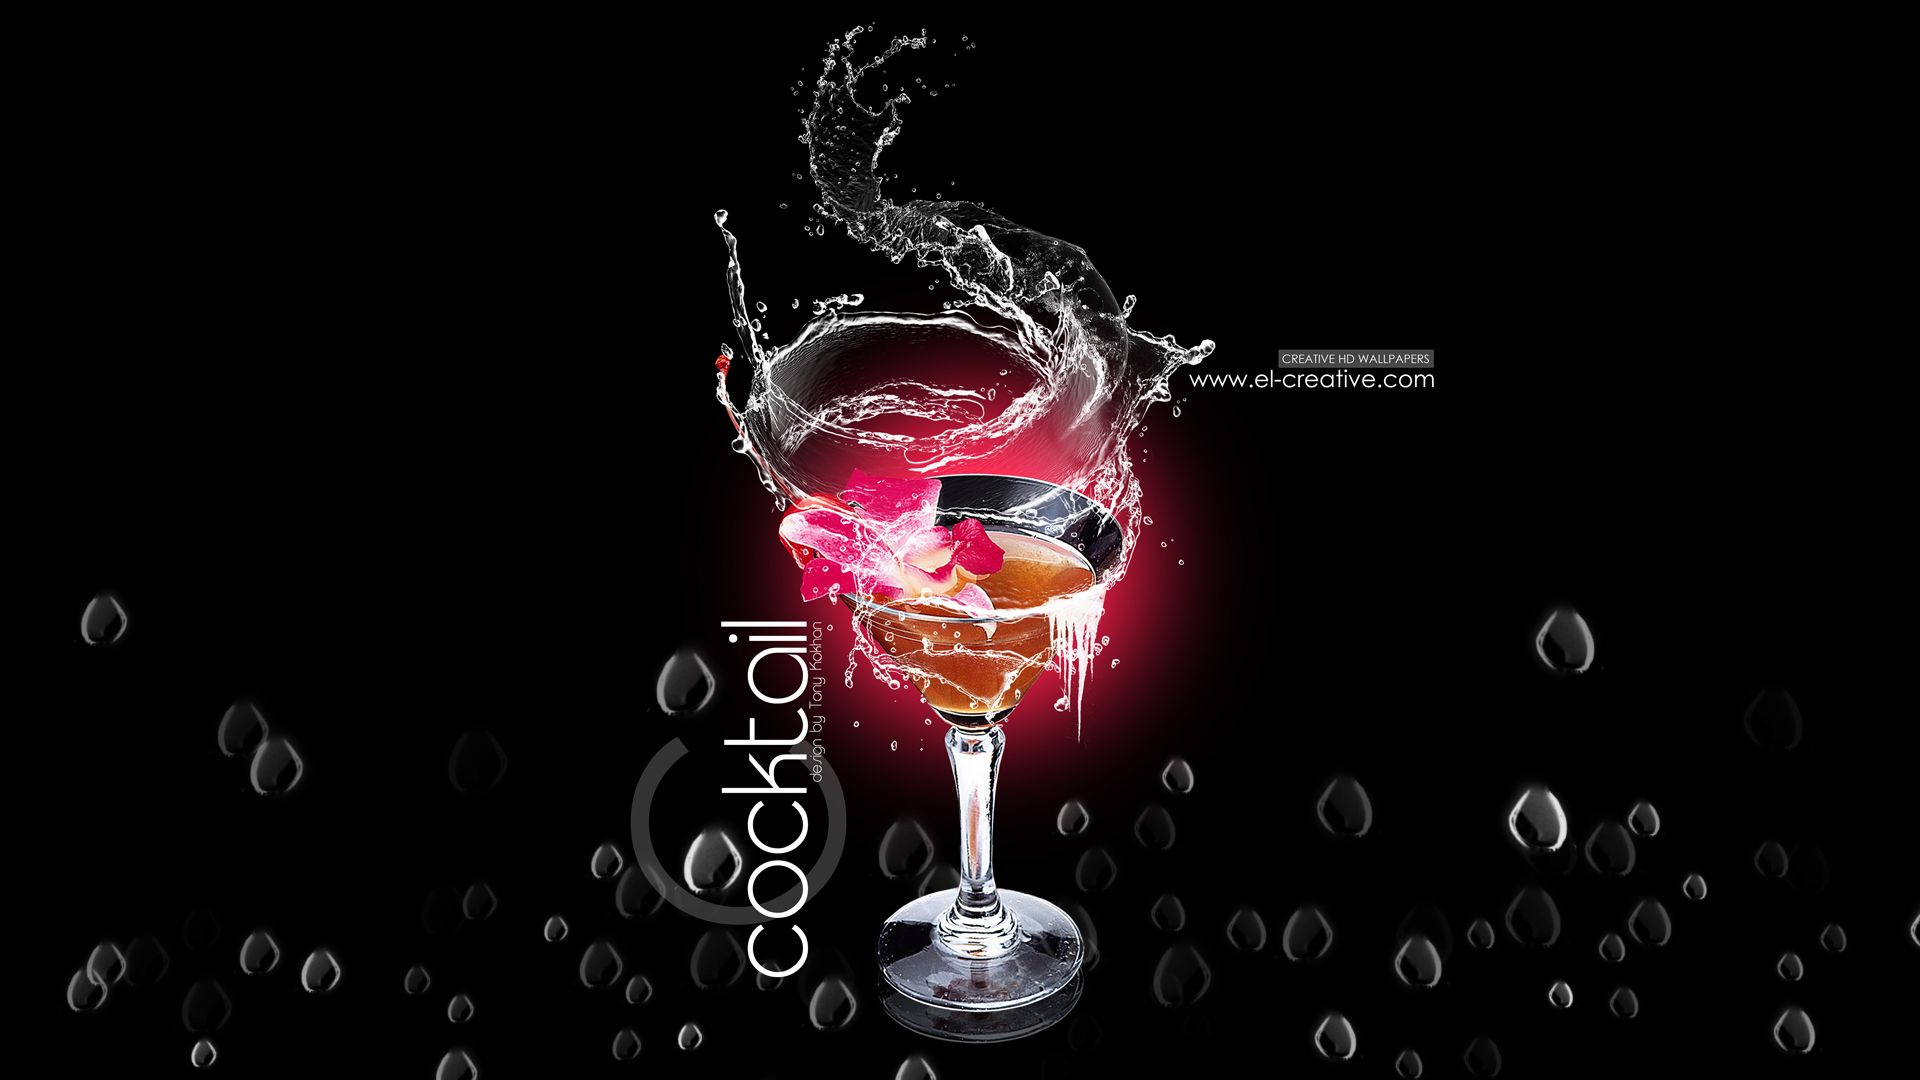 Metamorphosis Pink Cocktail Image Picture HD Wallpapers